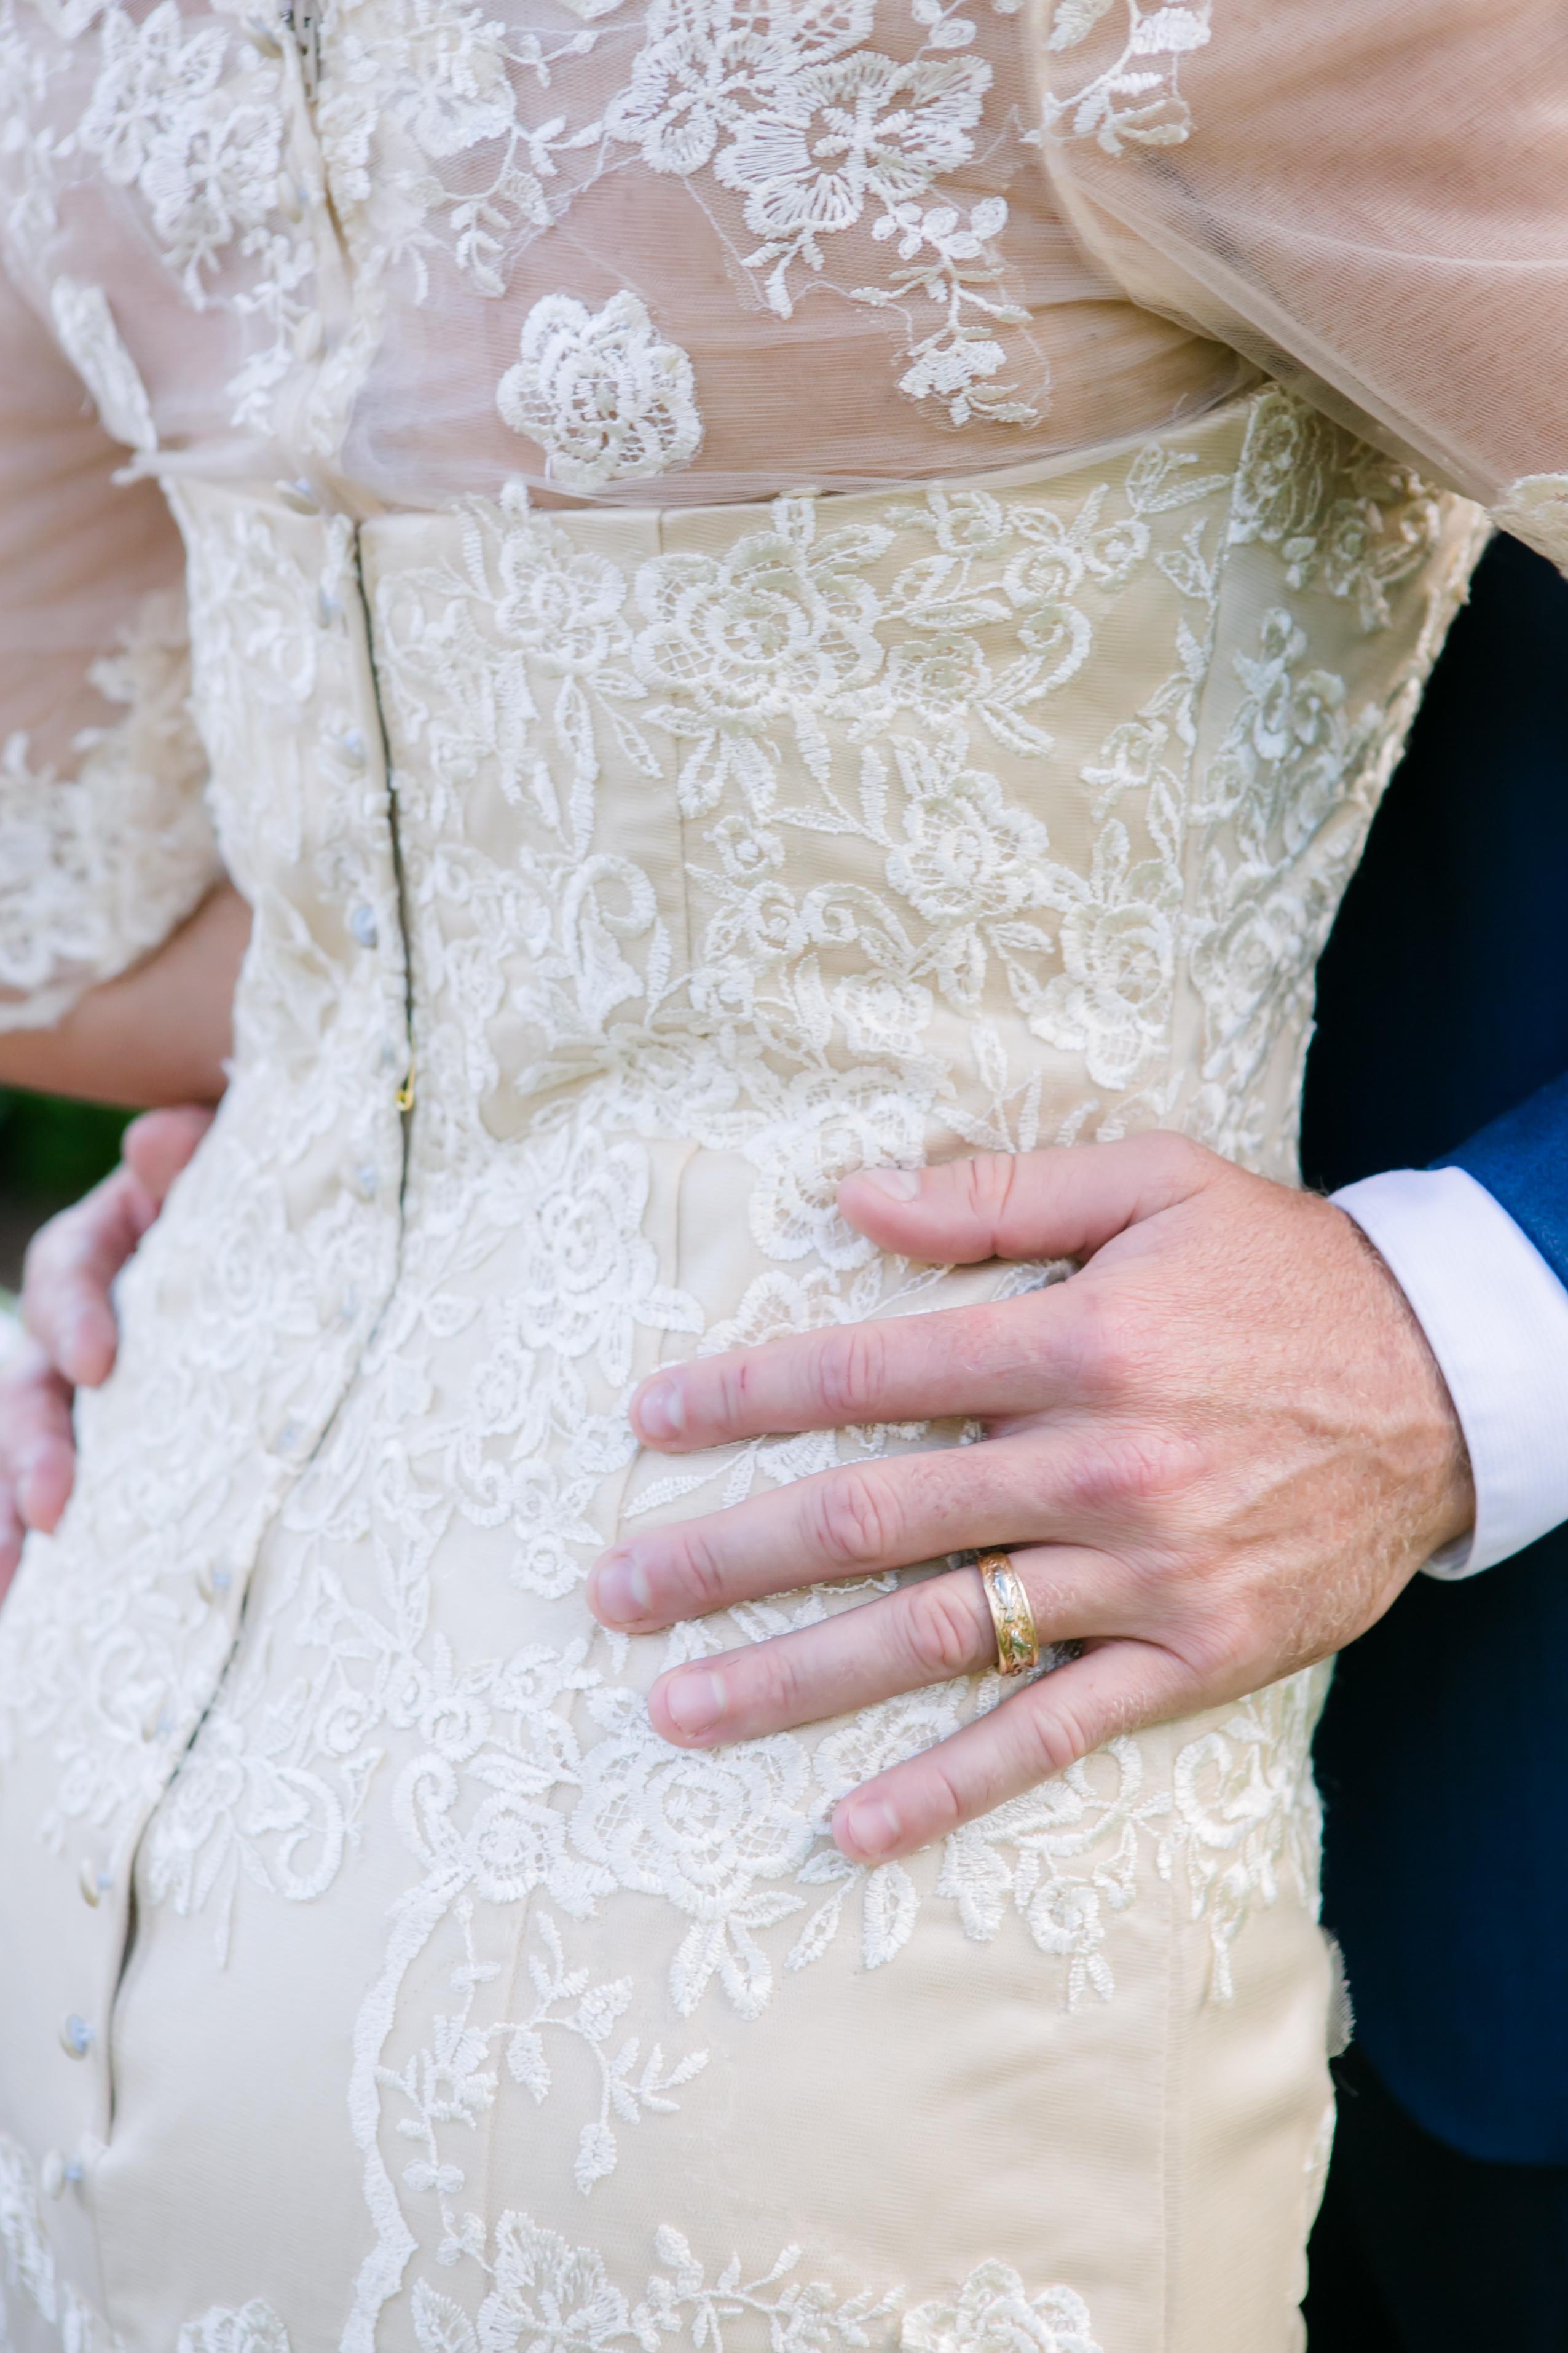 An Organically Beautiful Rustic Chic Inspired Wedding